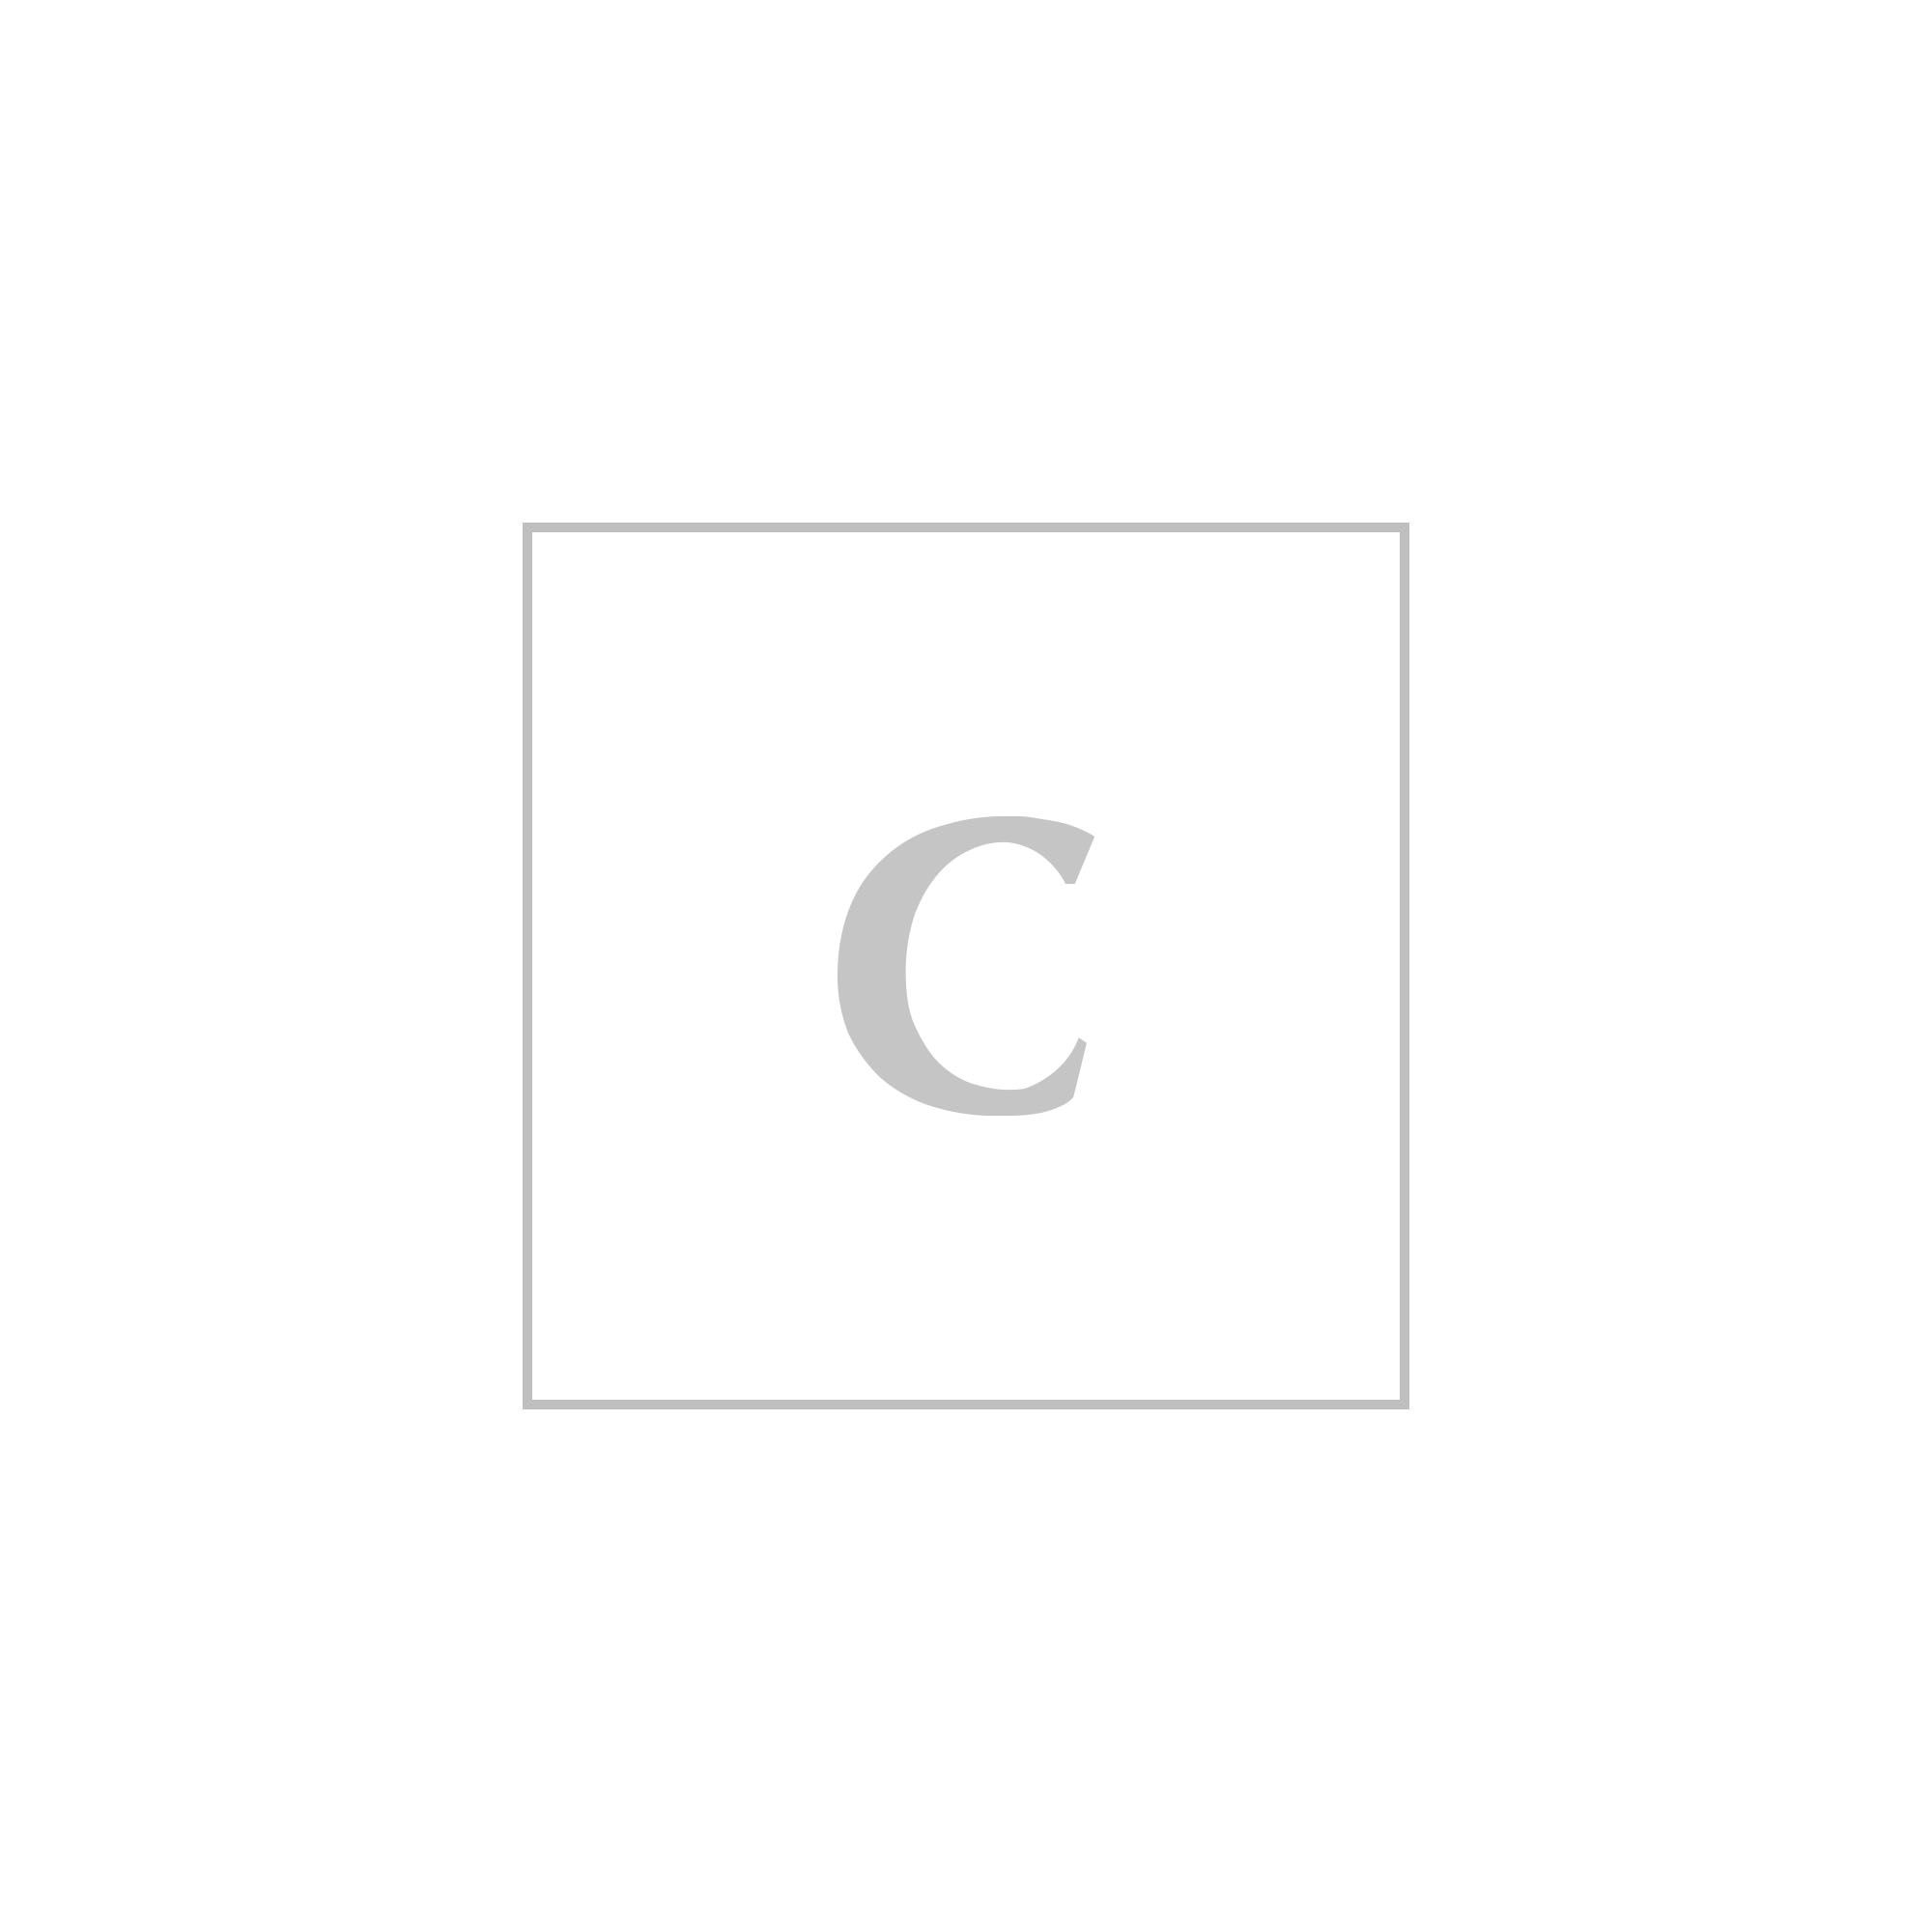 Moncler giacca rodin